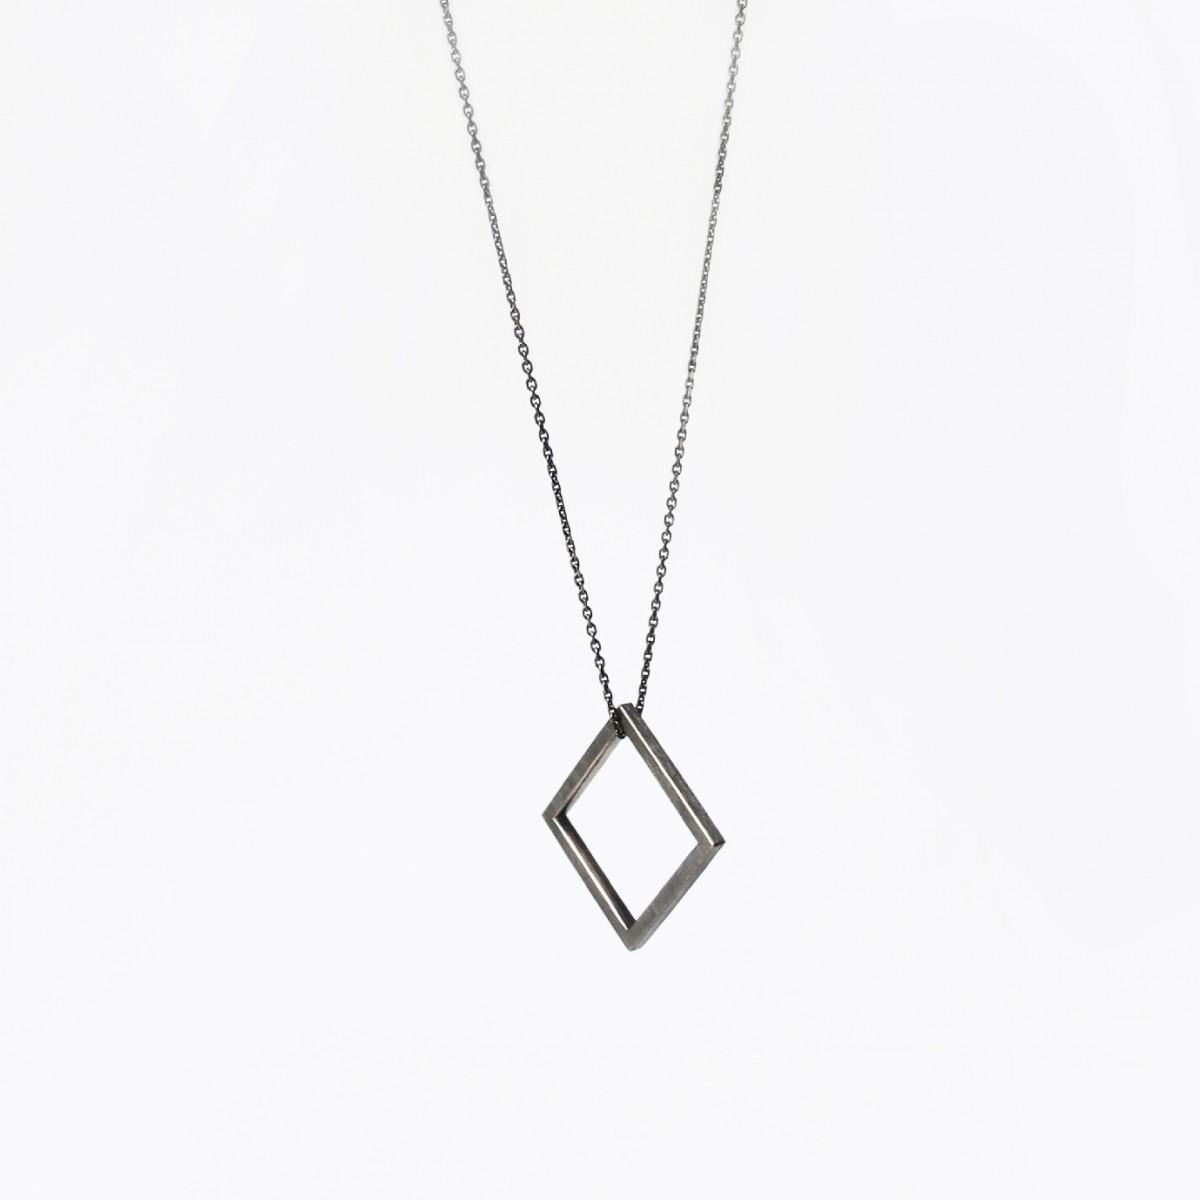 B KREB jewelry SQUARE necklace